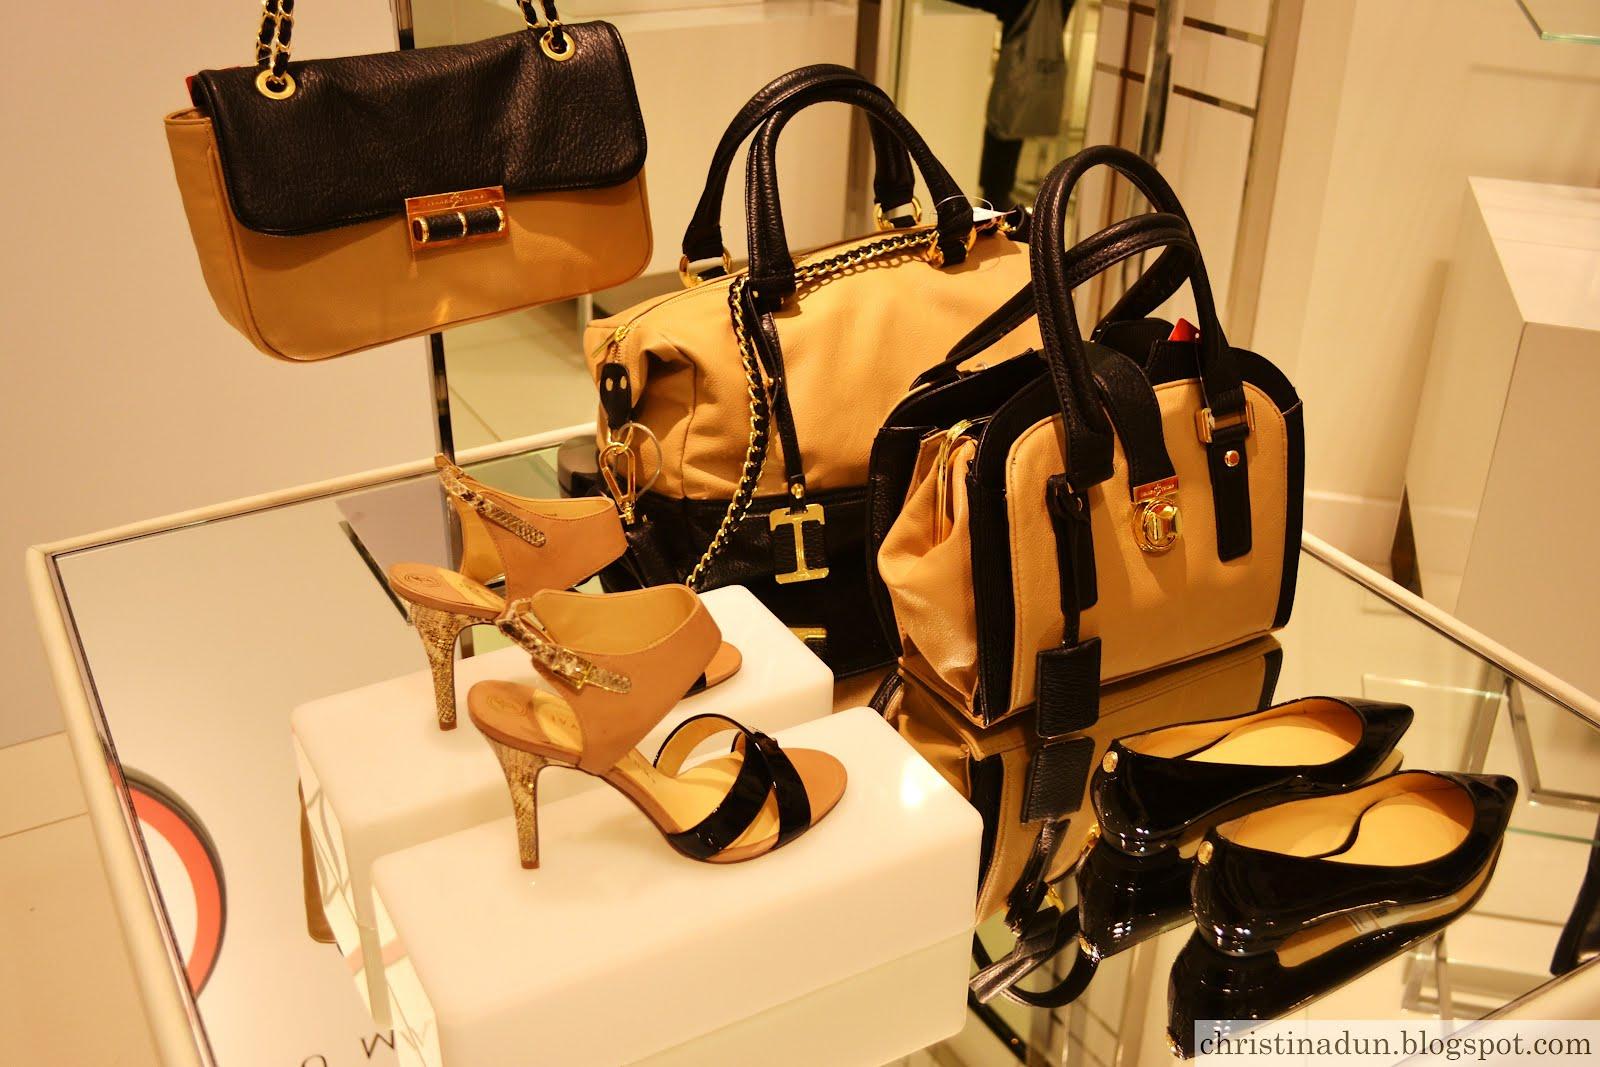 http://4.bp.blogspot.com/-MO_ZBJK1LlA/T1bgJgbpzZI/AAAAAAAAC6o/lszKX5T1AWg/s1600/DSC_0287.jpg